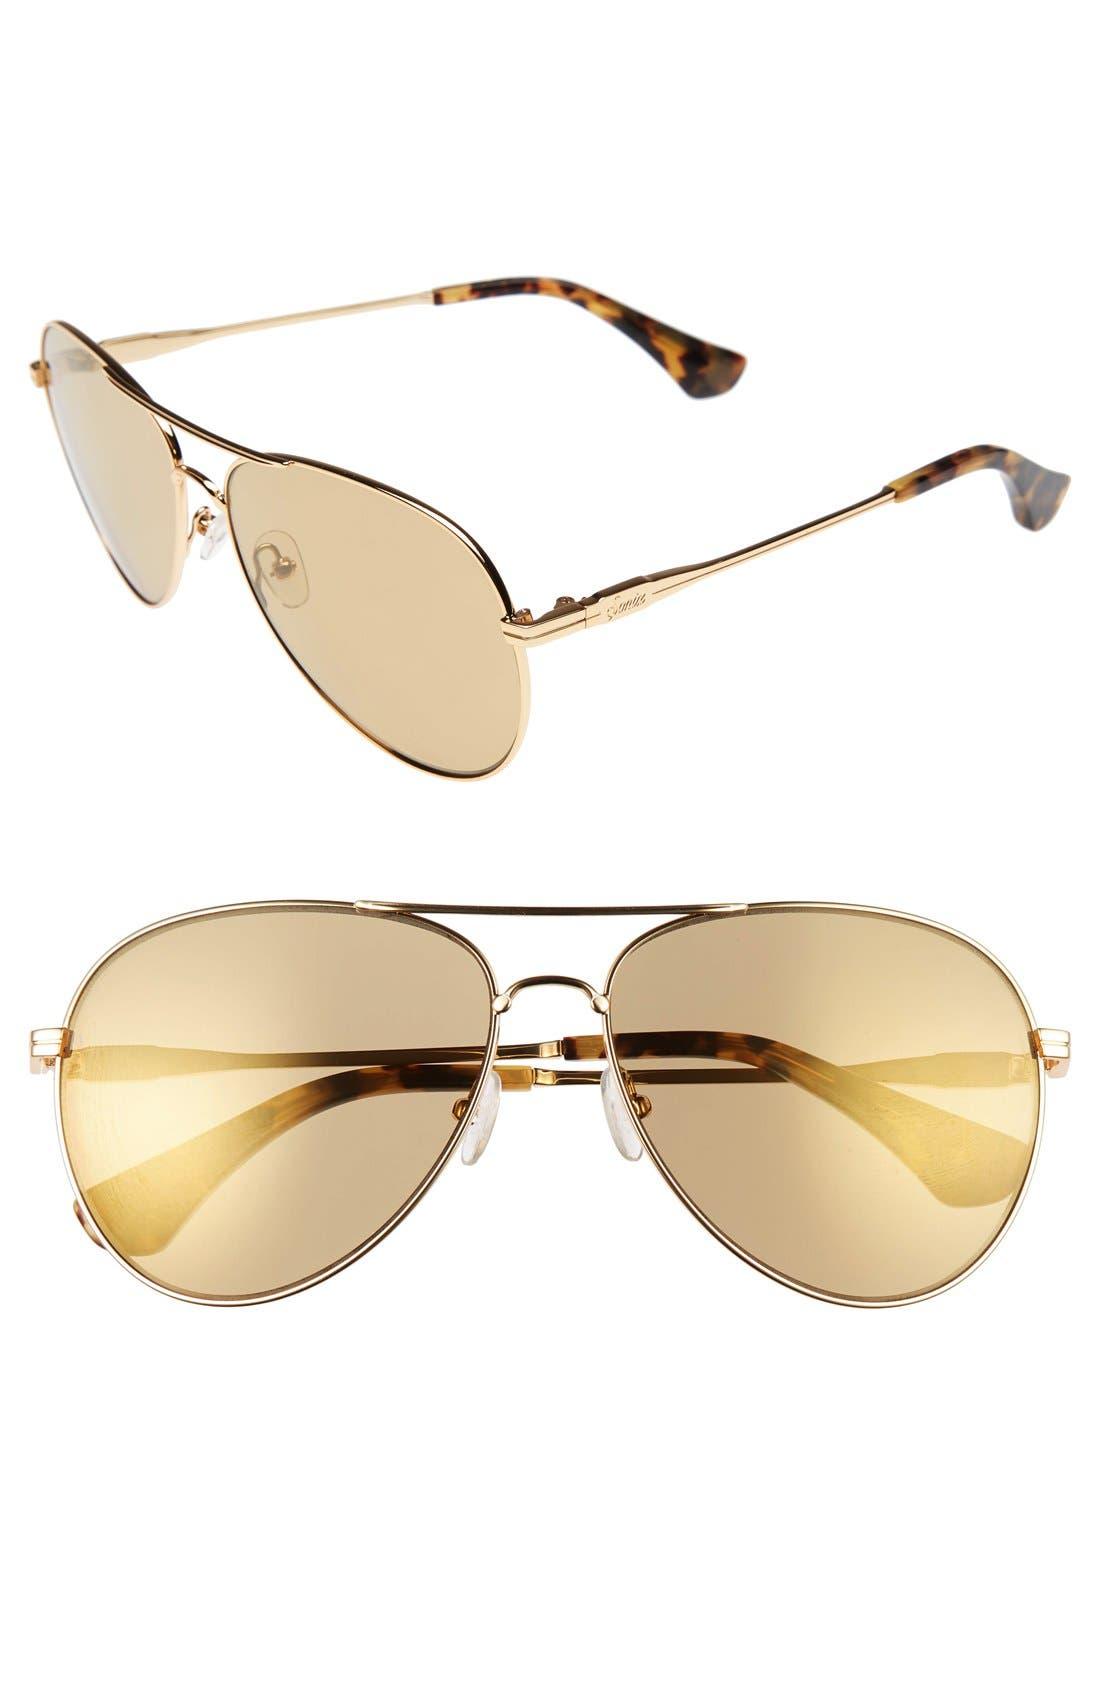 Alternate Image 1 Selected - Sonix Lodi 62mm Mirrored Aviator Sunglasses